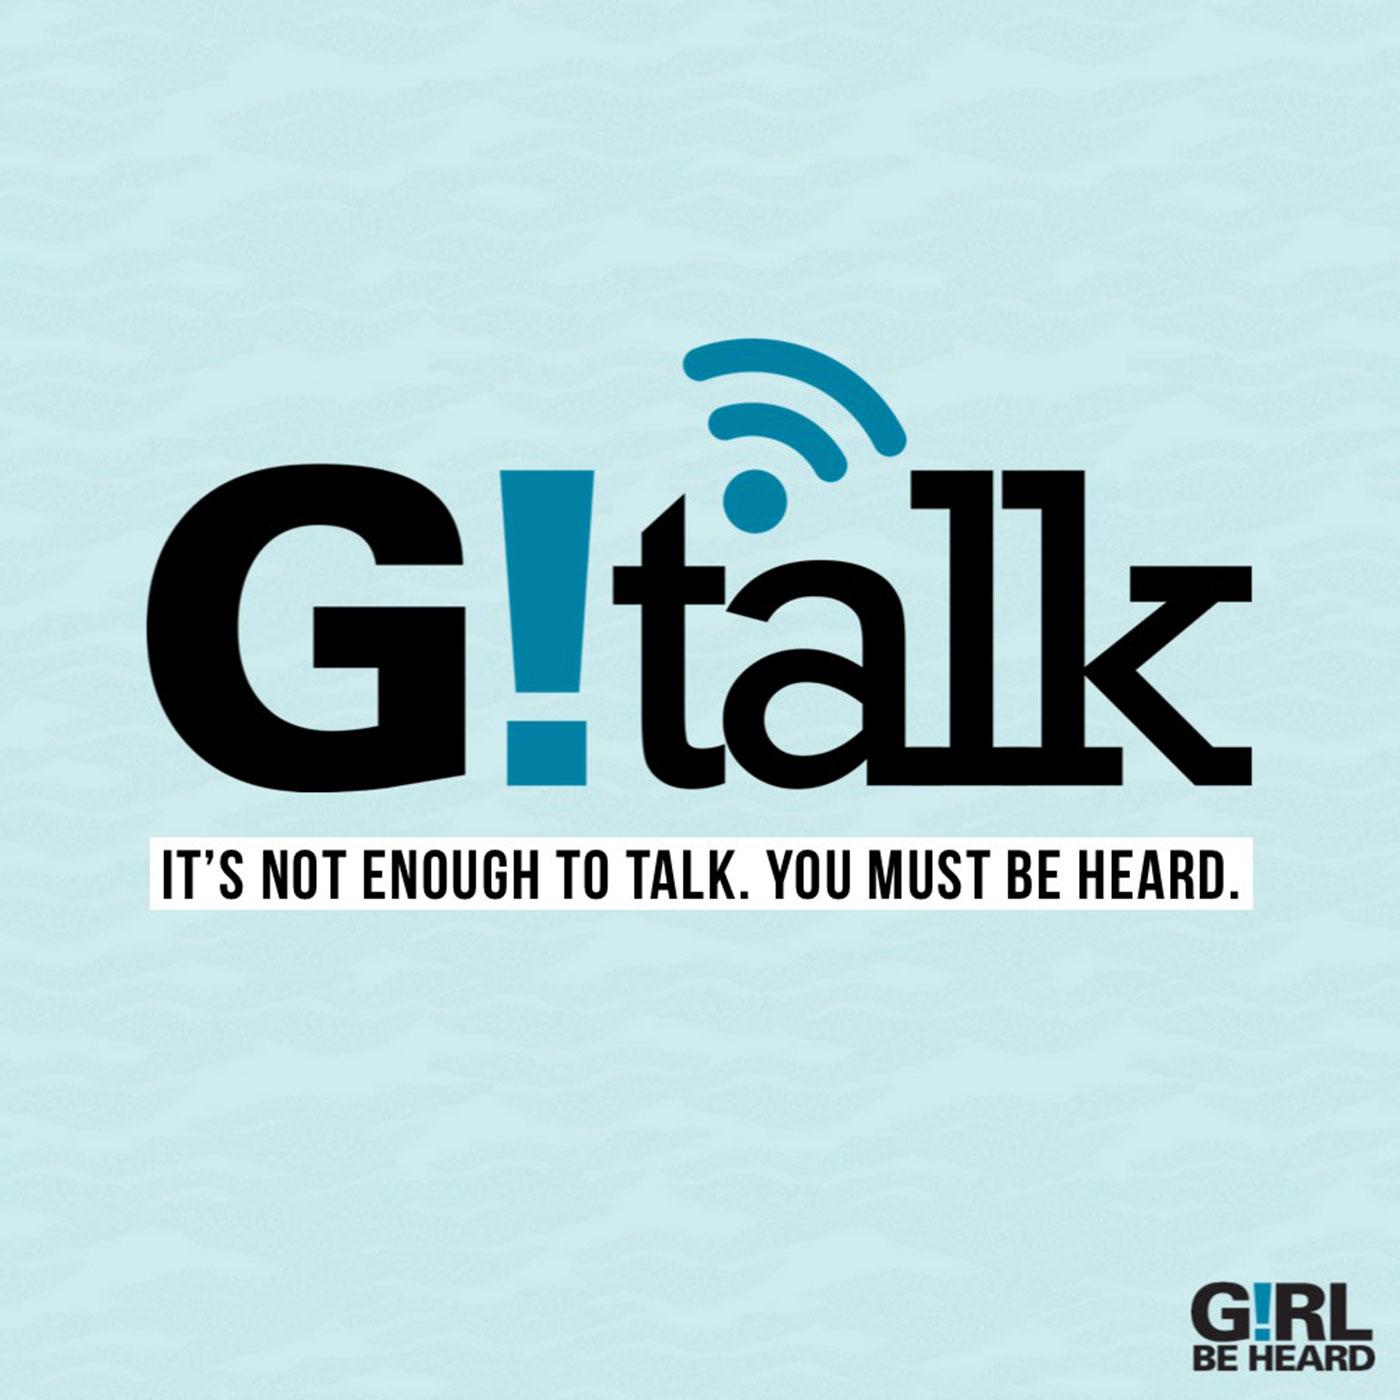 Girl Be Heard GTALK Podcast